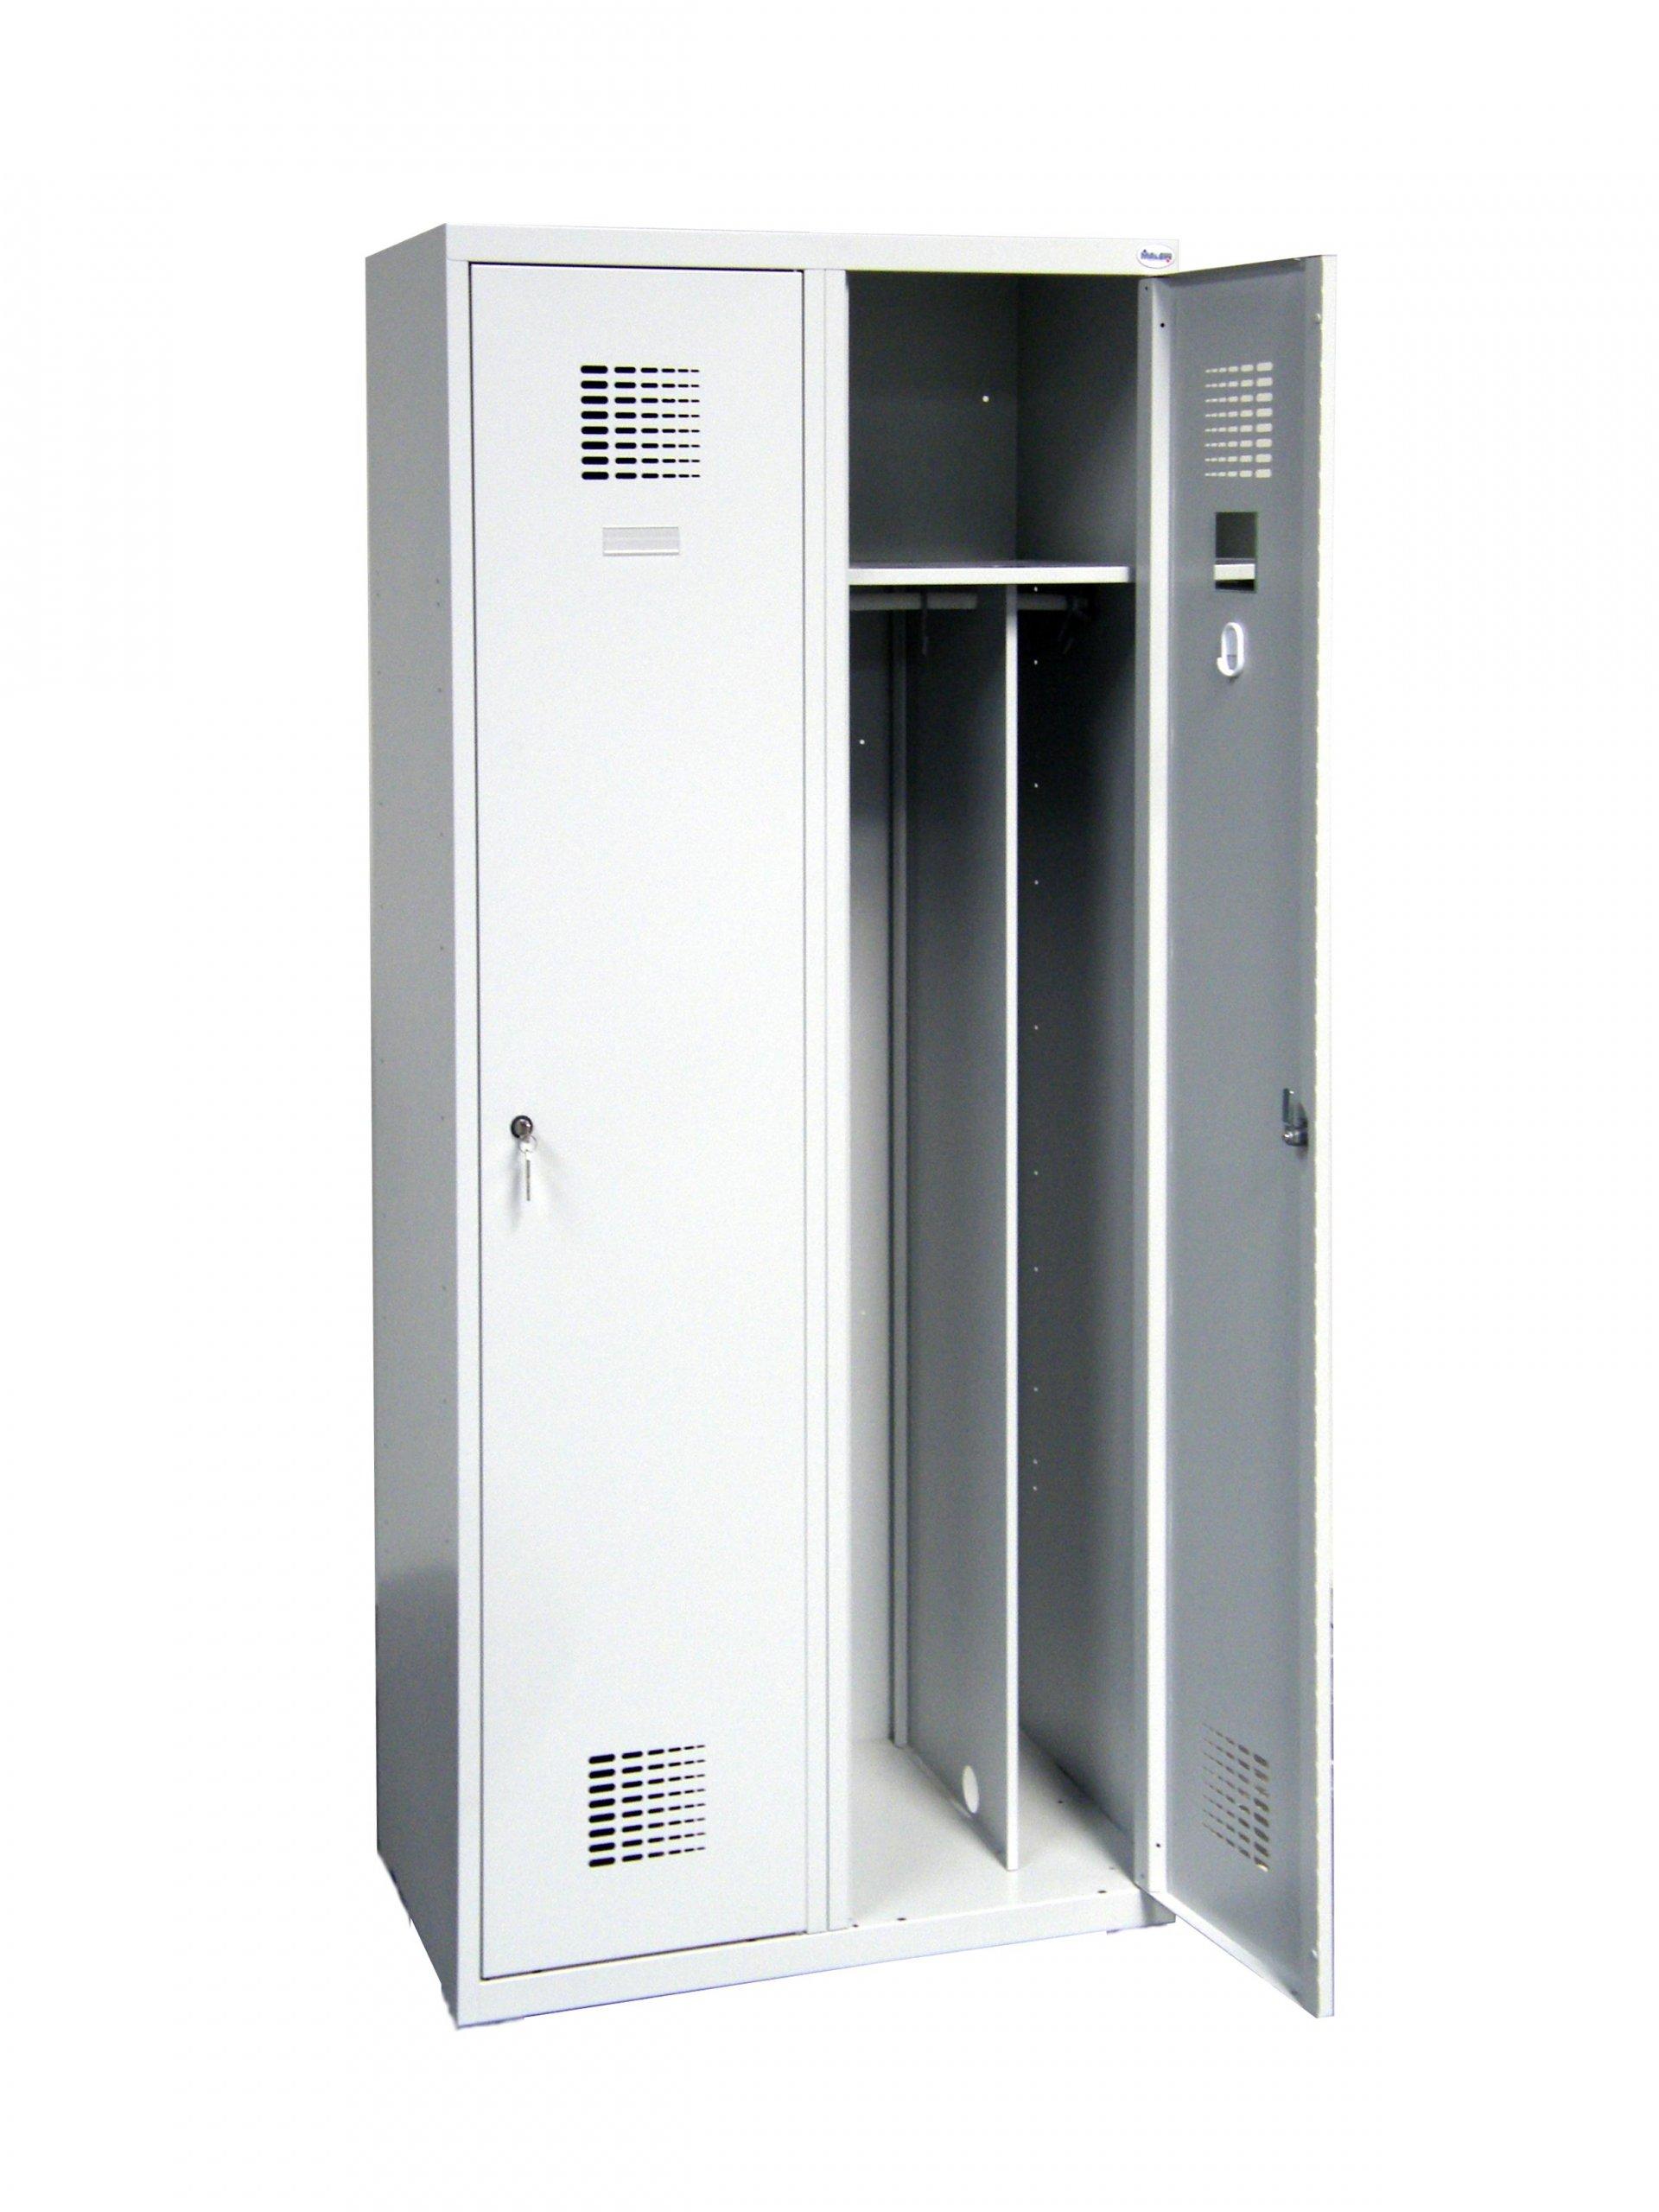 Шкаф металлический шкаф ??? одежды Sum420W мебелью охраны ТРУДА, социал